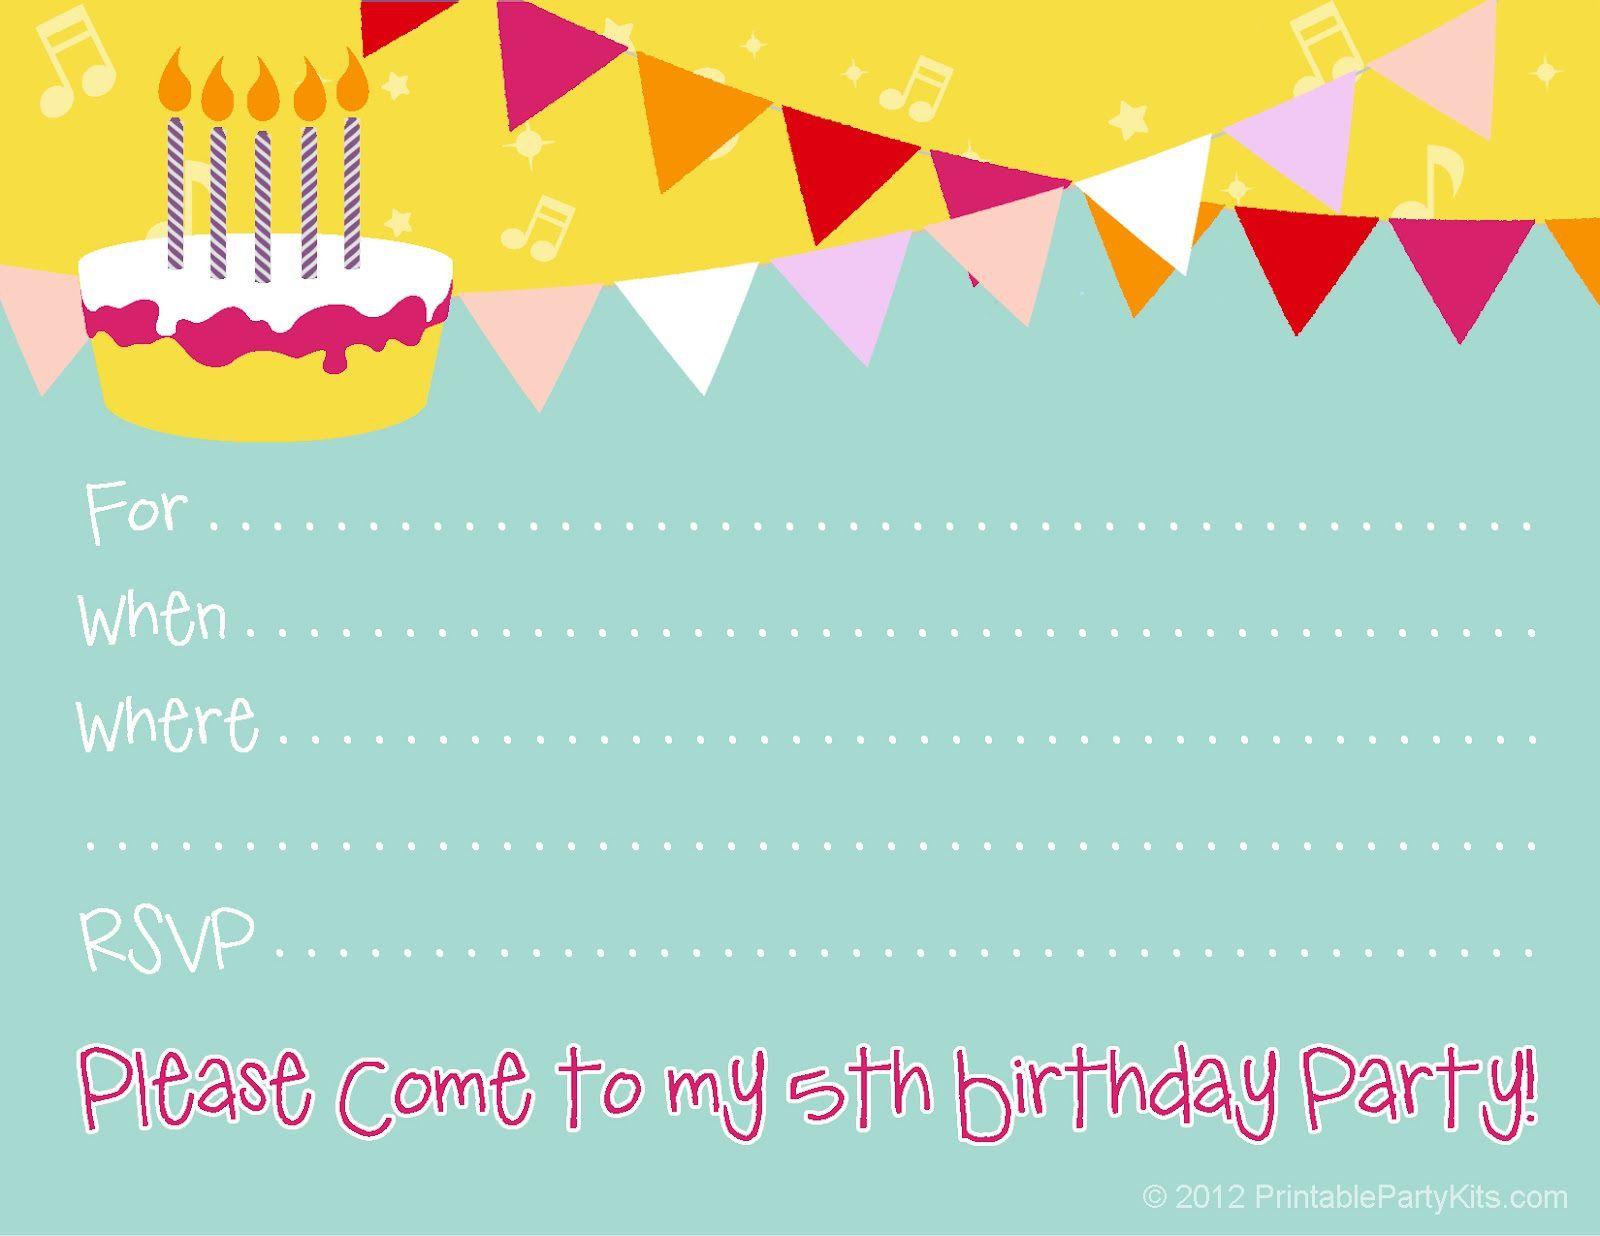 007 Stunning Free Birthday Party Invitation Template Example  Templates Printable 16th Australia UkFull